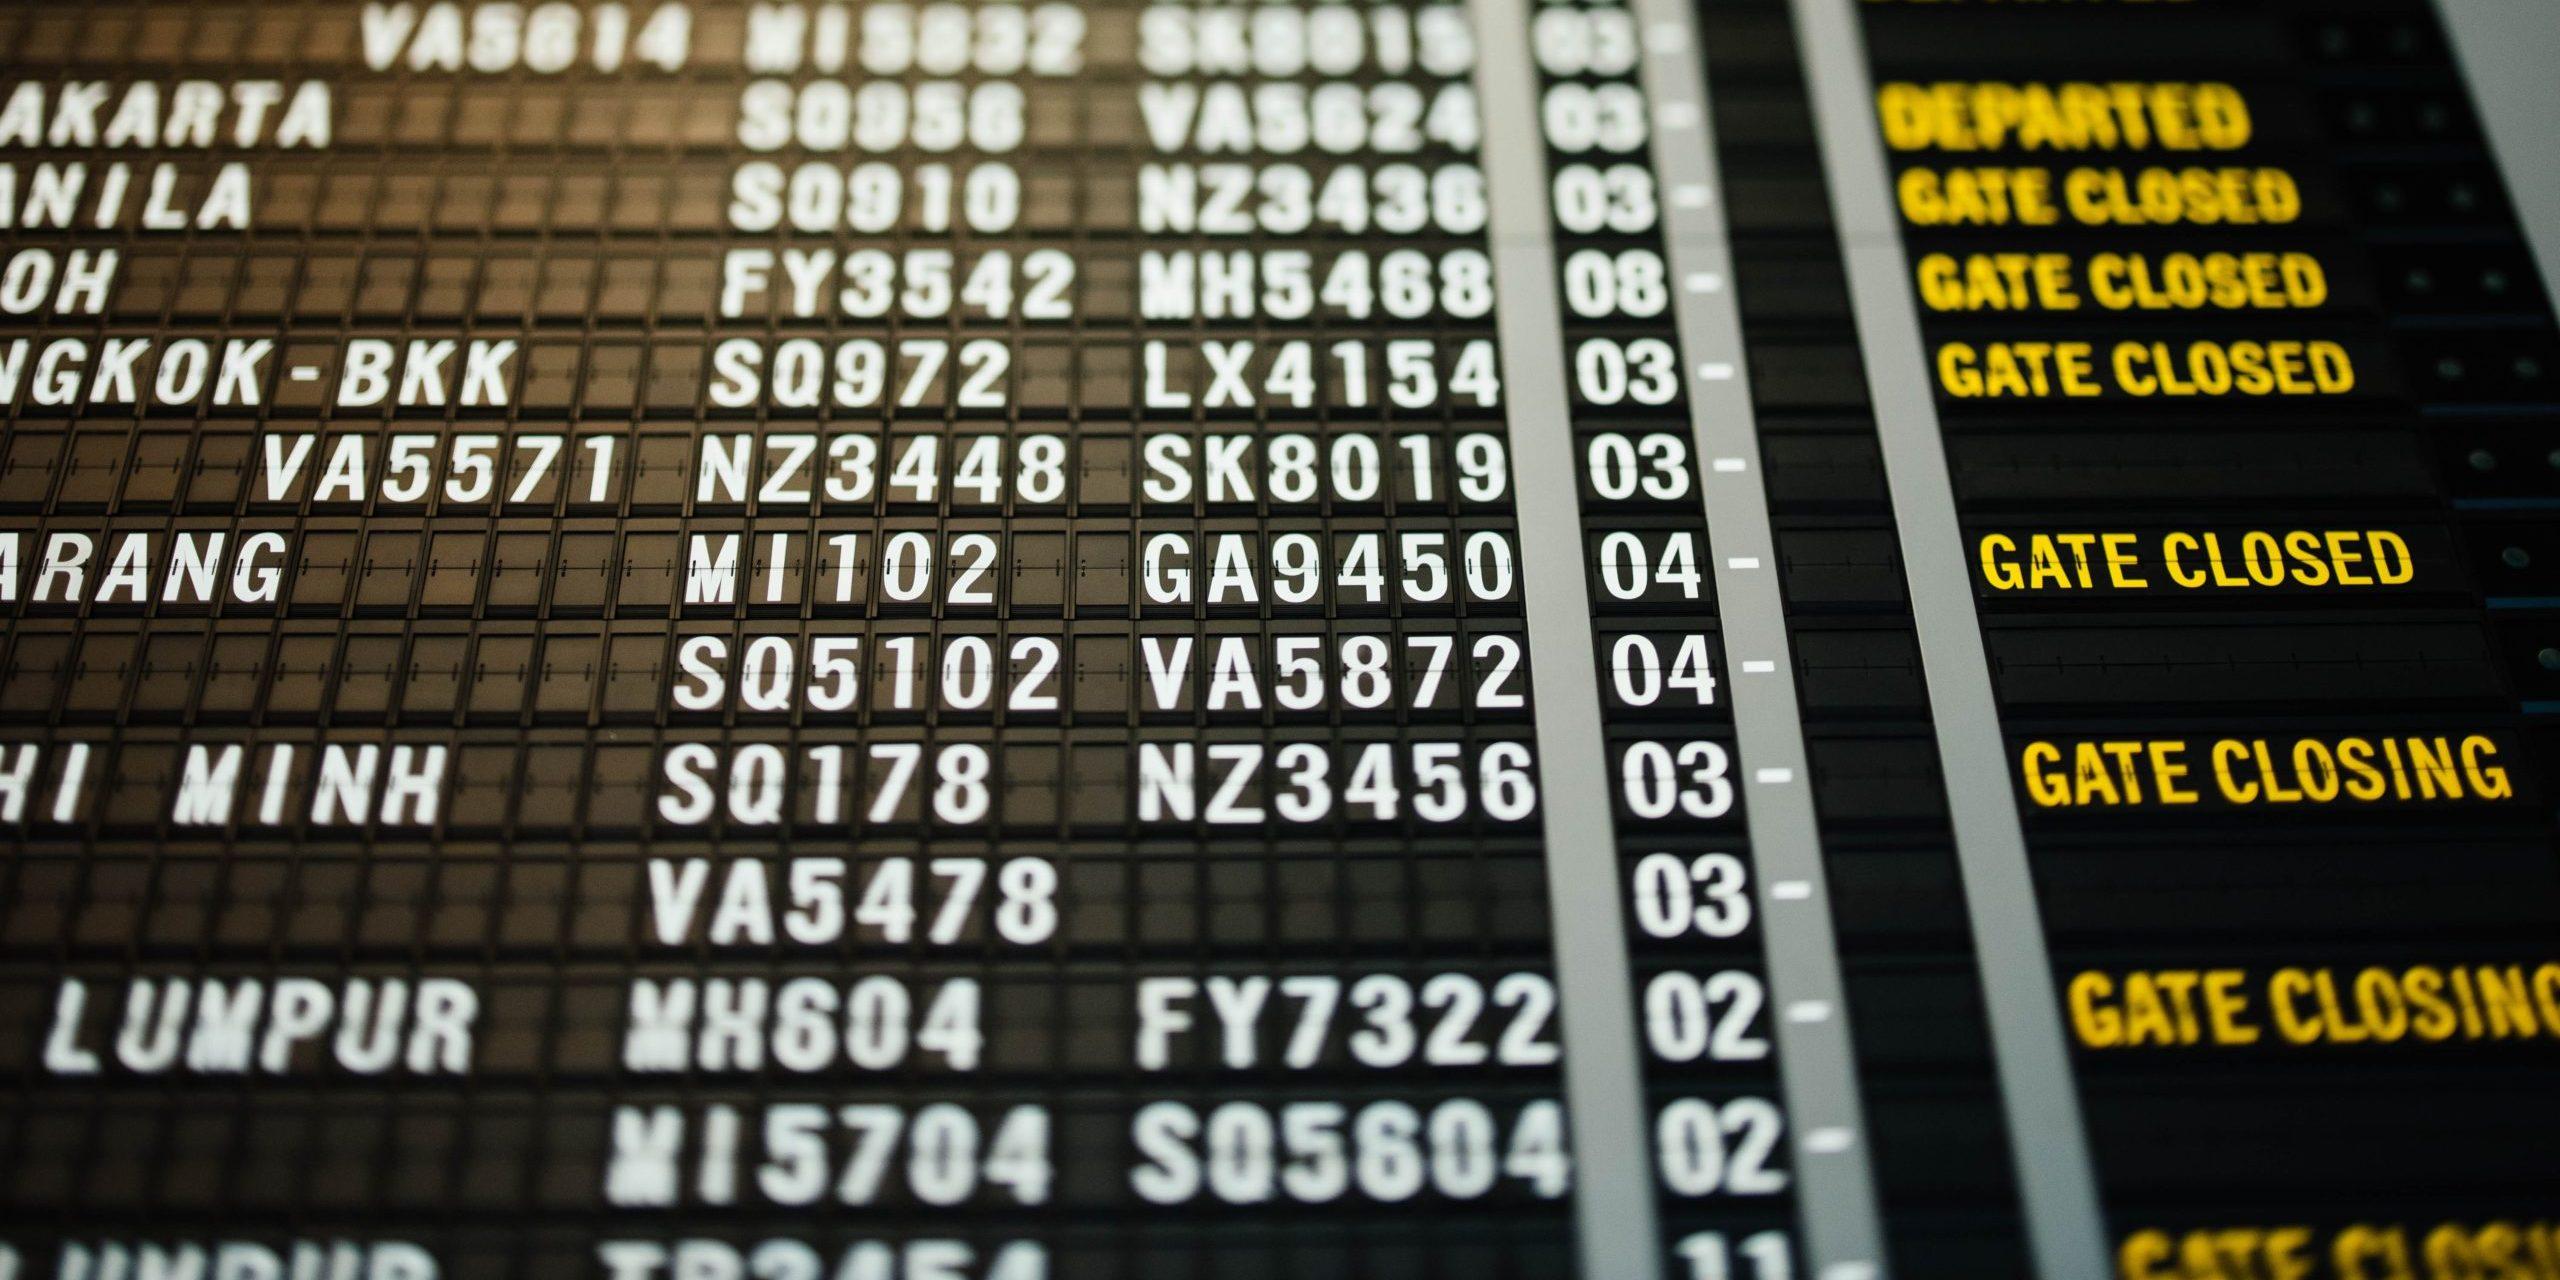 flight schedule change